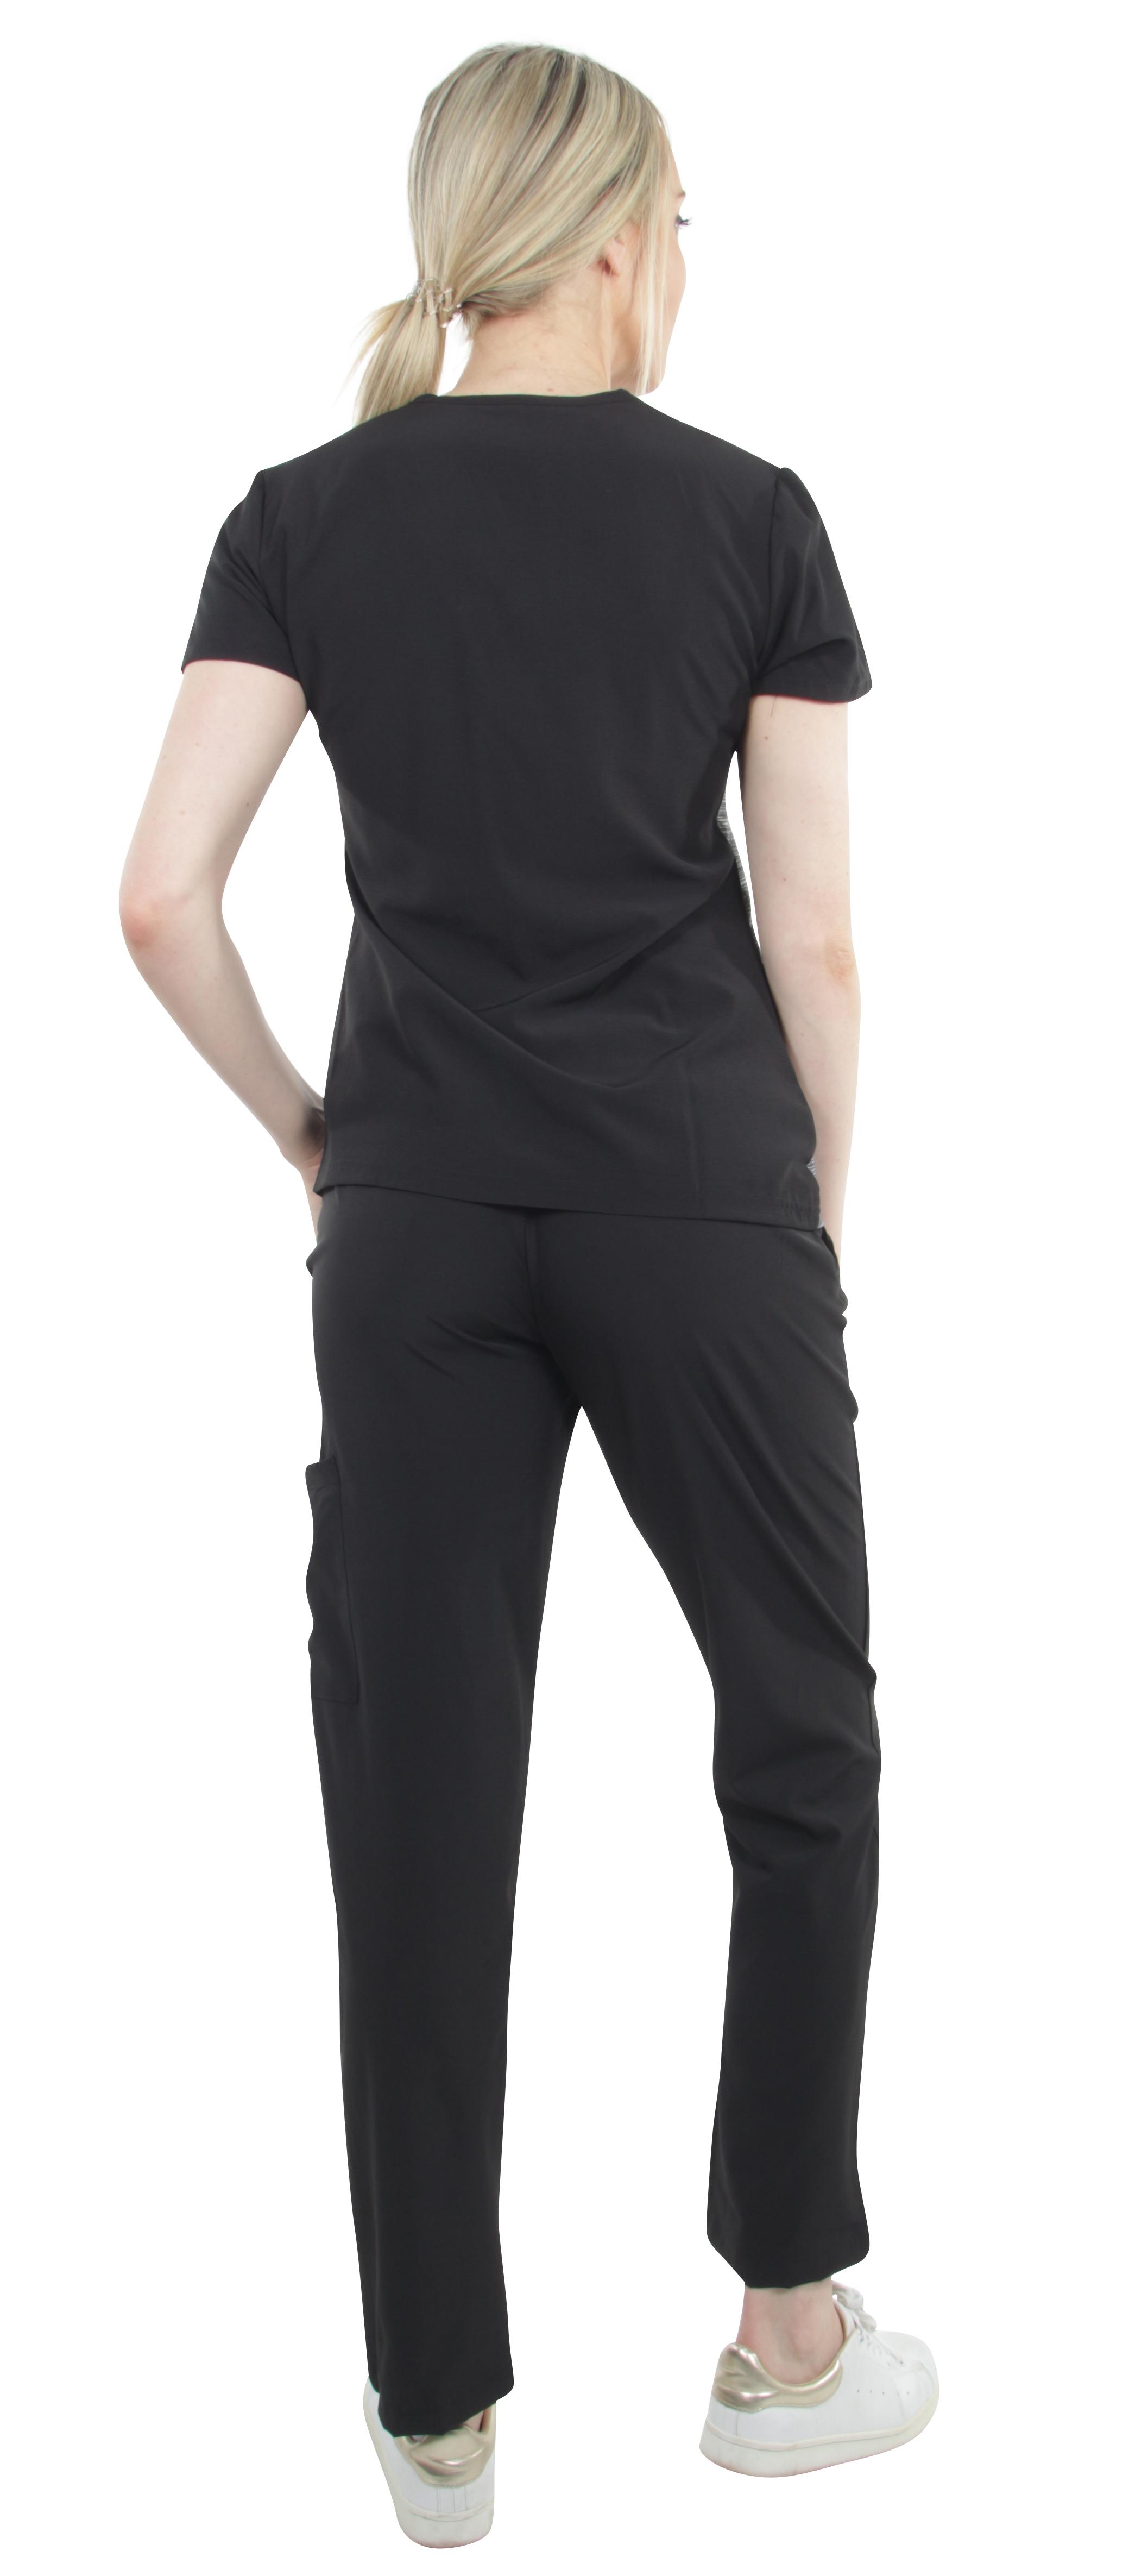 Unisex-Performance-Stretch-Medical-Uniform-Five-Pockets-V-Neck-Scrubs-Sets miniature 16